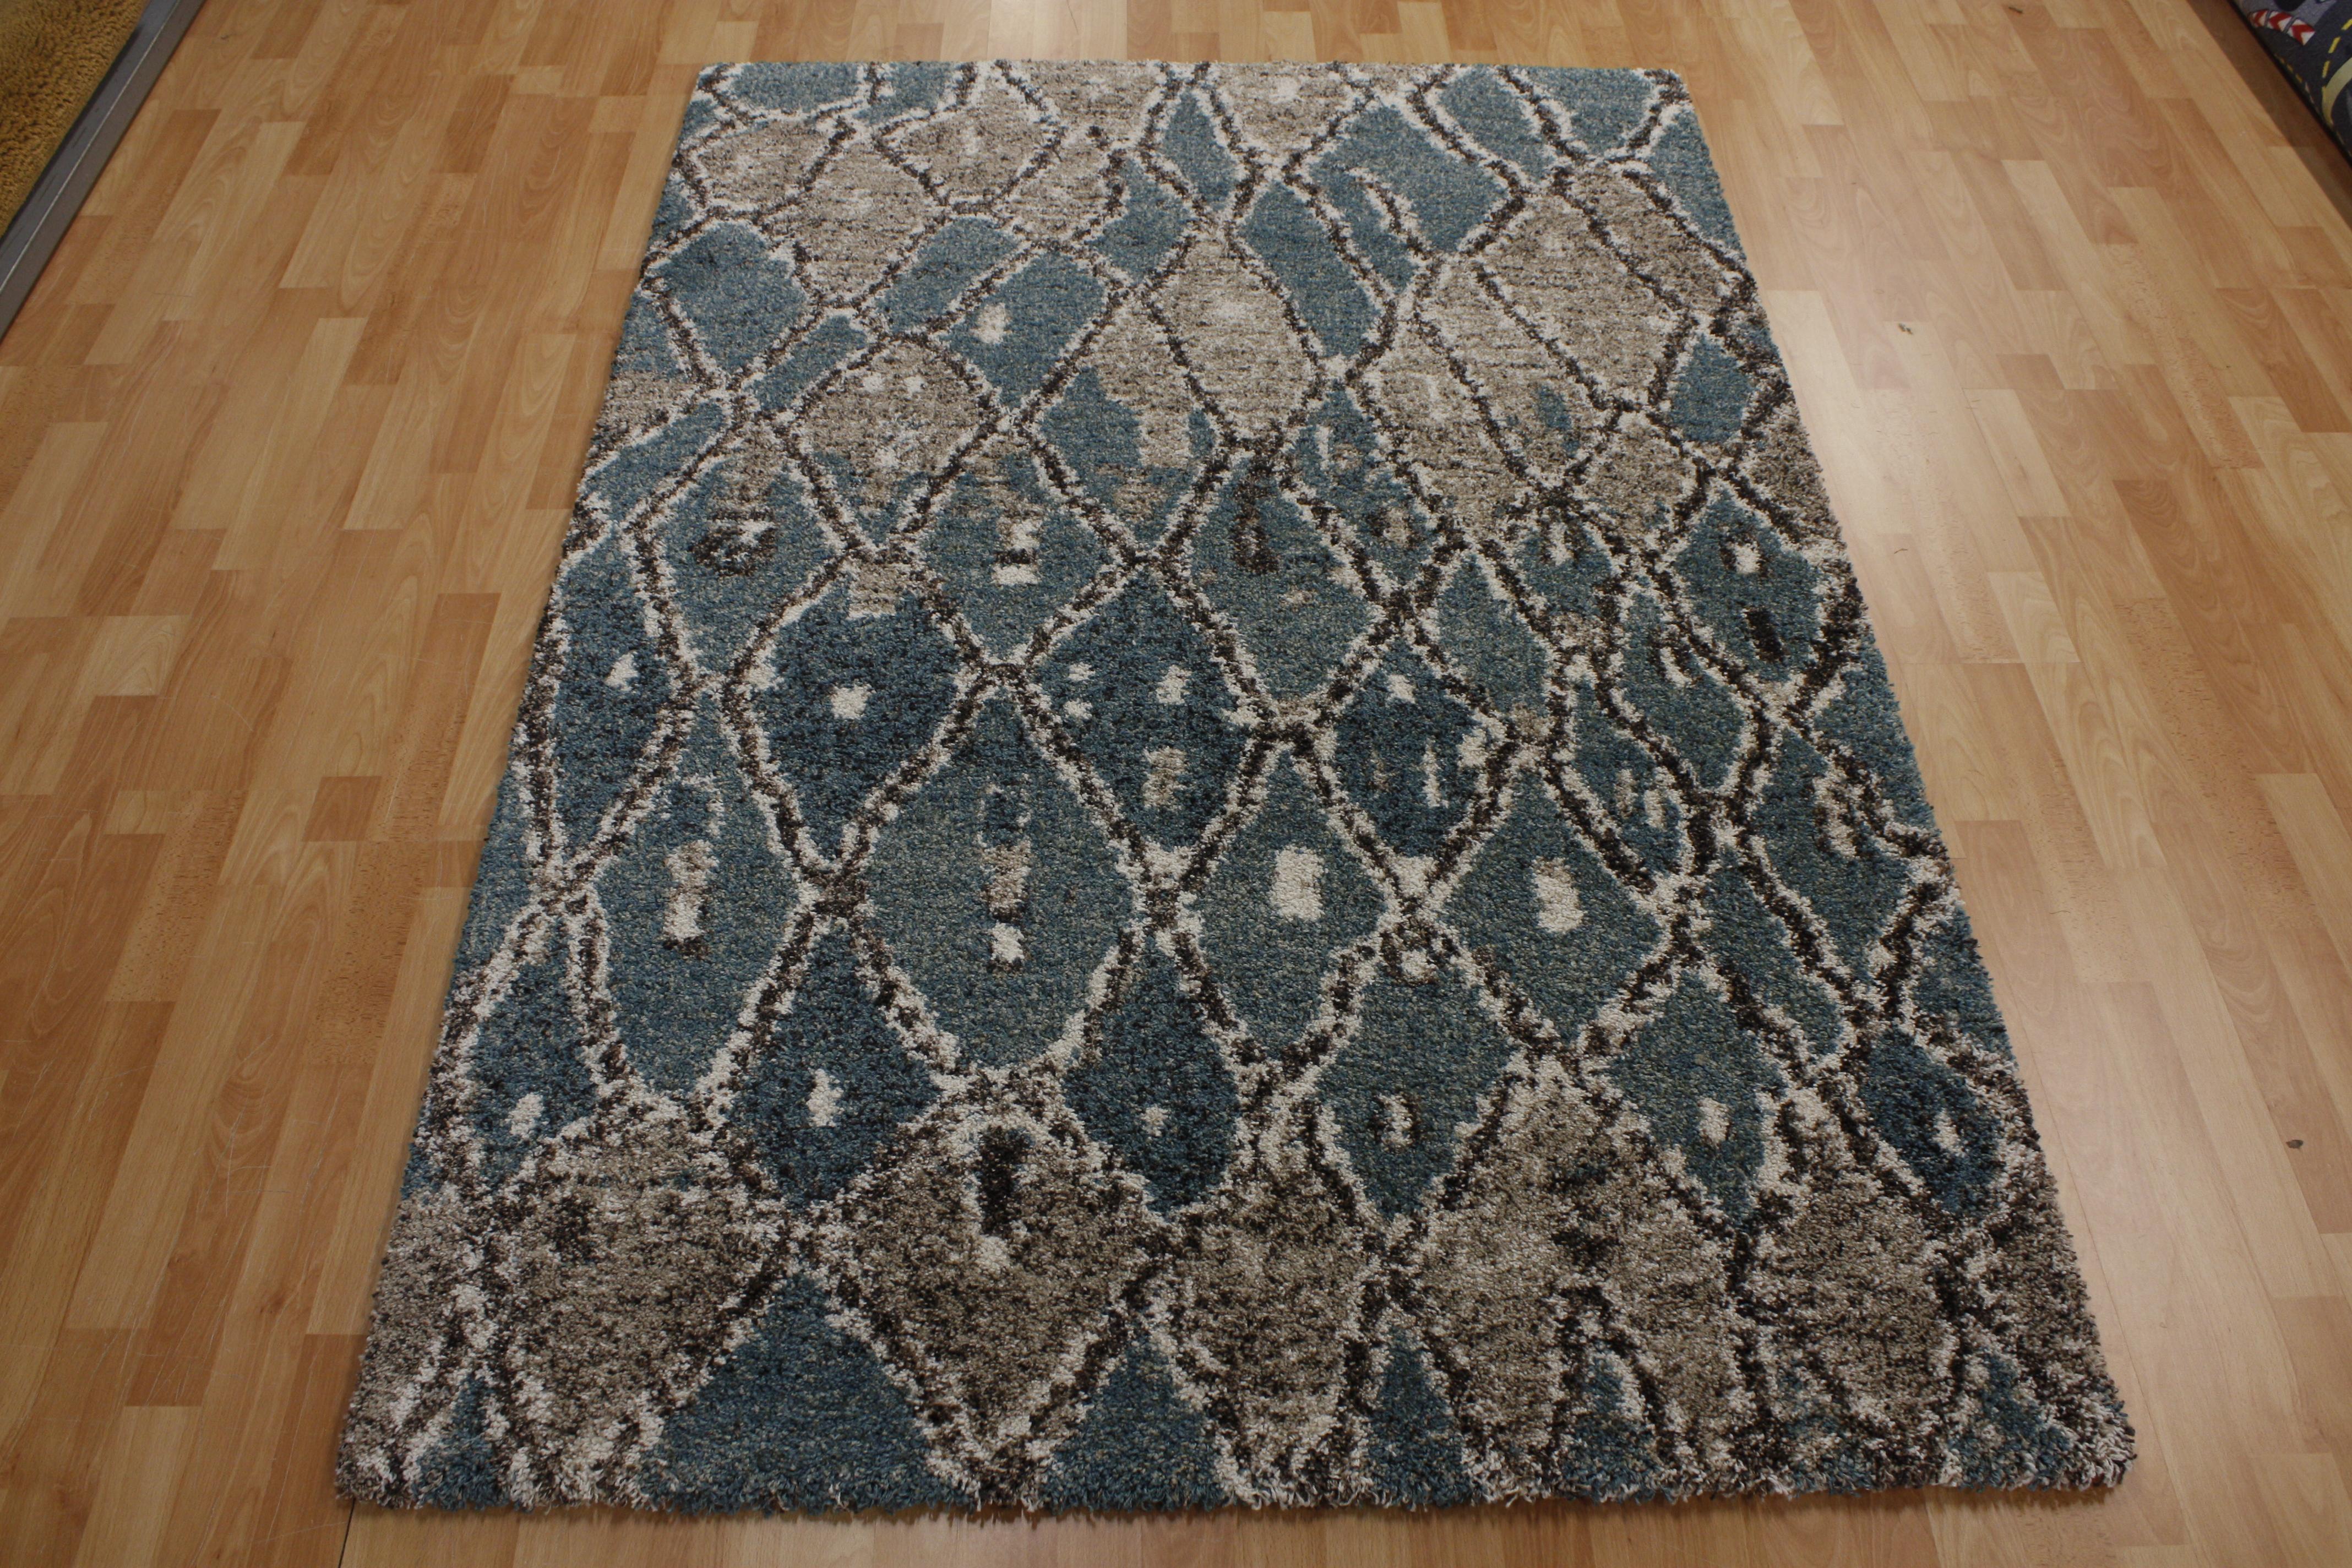 Mehari tappeto 23066 5969 ragolle 133x195cm quadrato - Tappeto riscaldamento pavimento ...